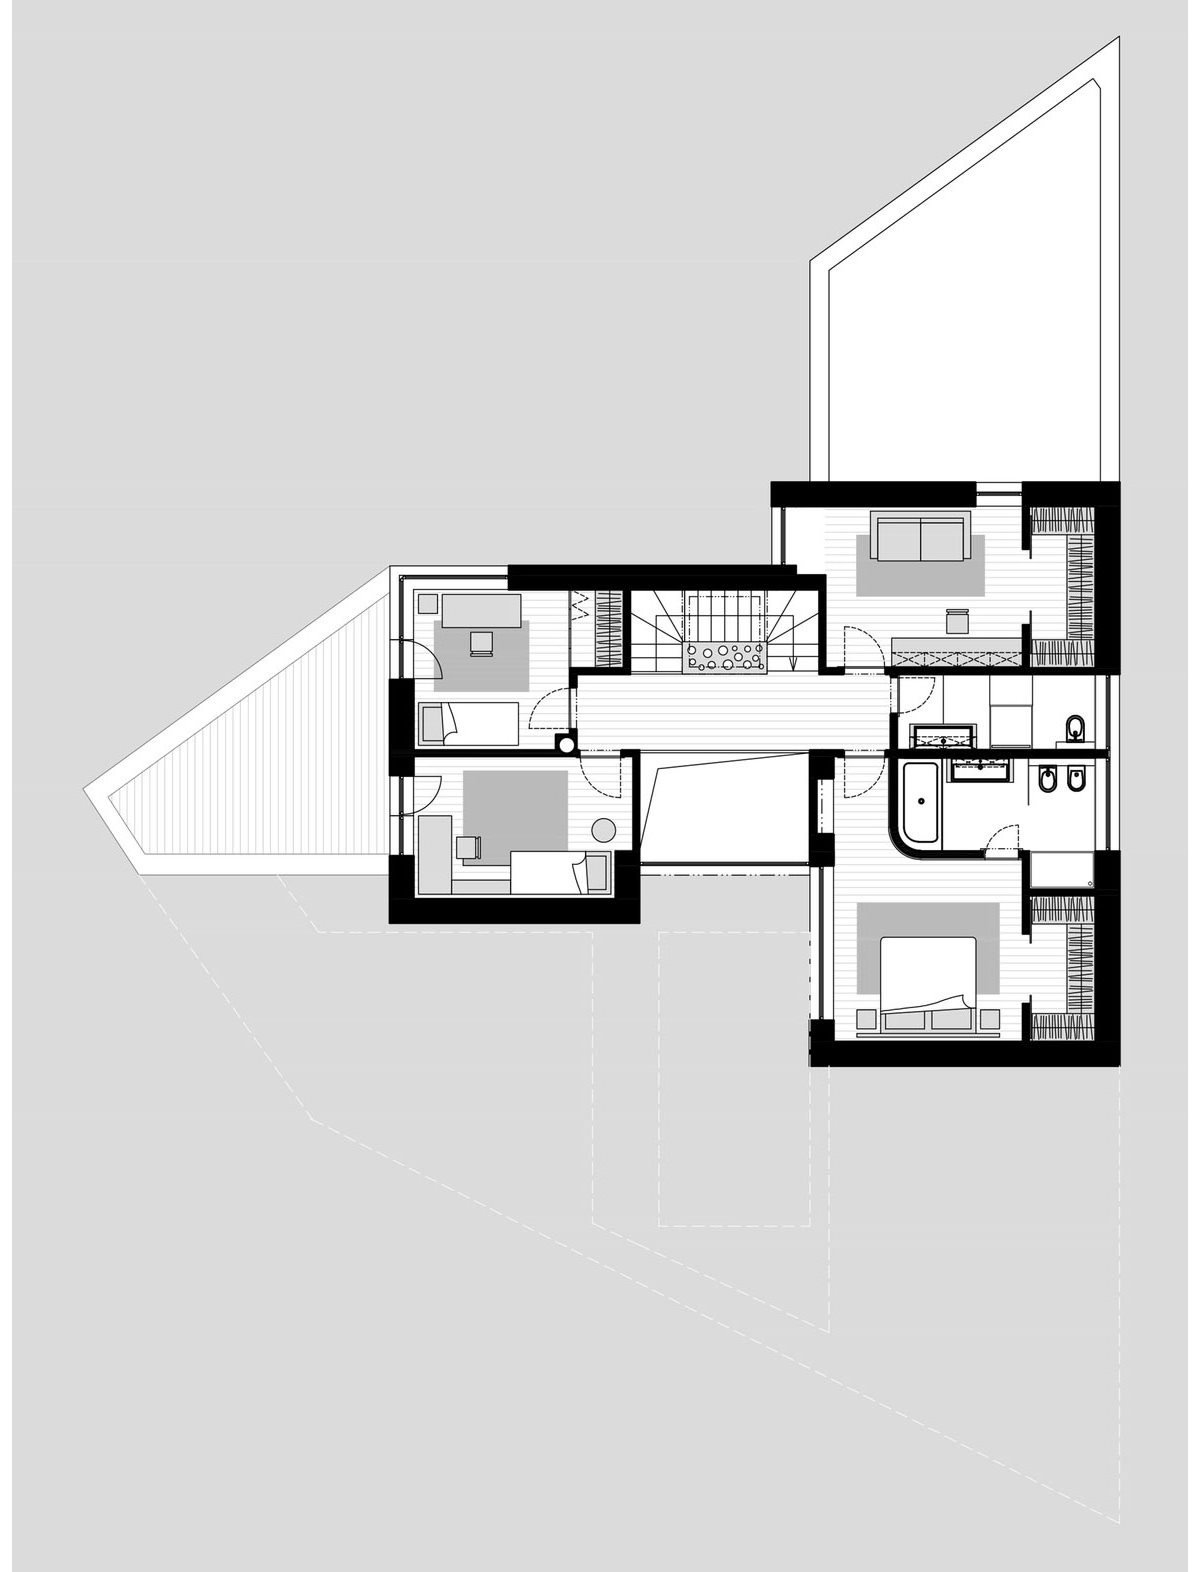 at26 architecture & design, White Cubes House, угловой дом фото, белые частные дома фото, обзор частного дома фото, планировка частного дома фото